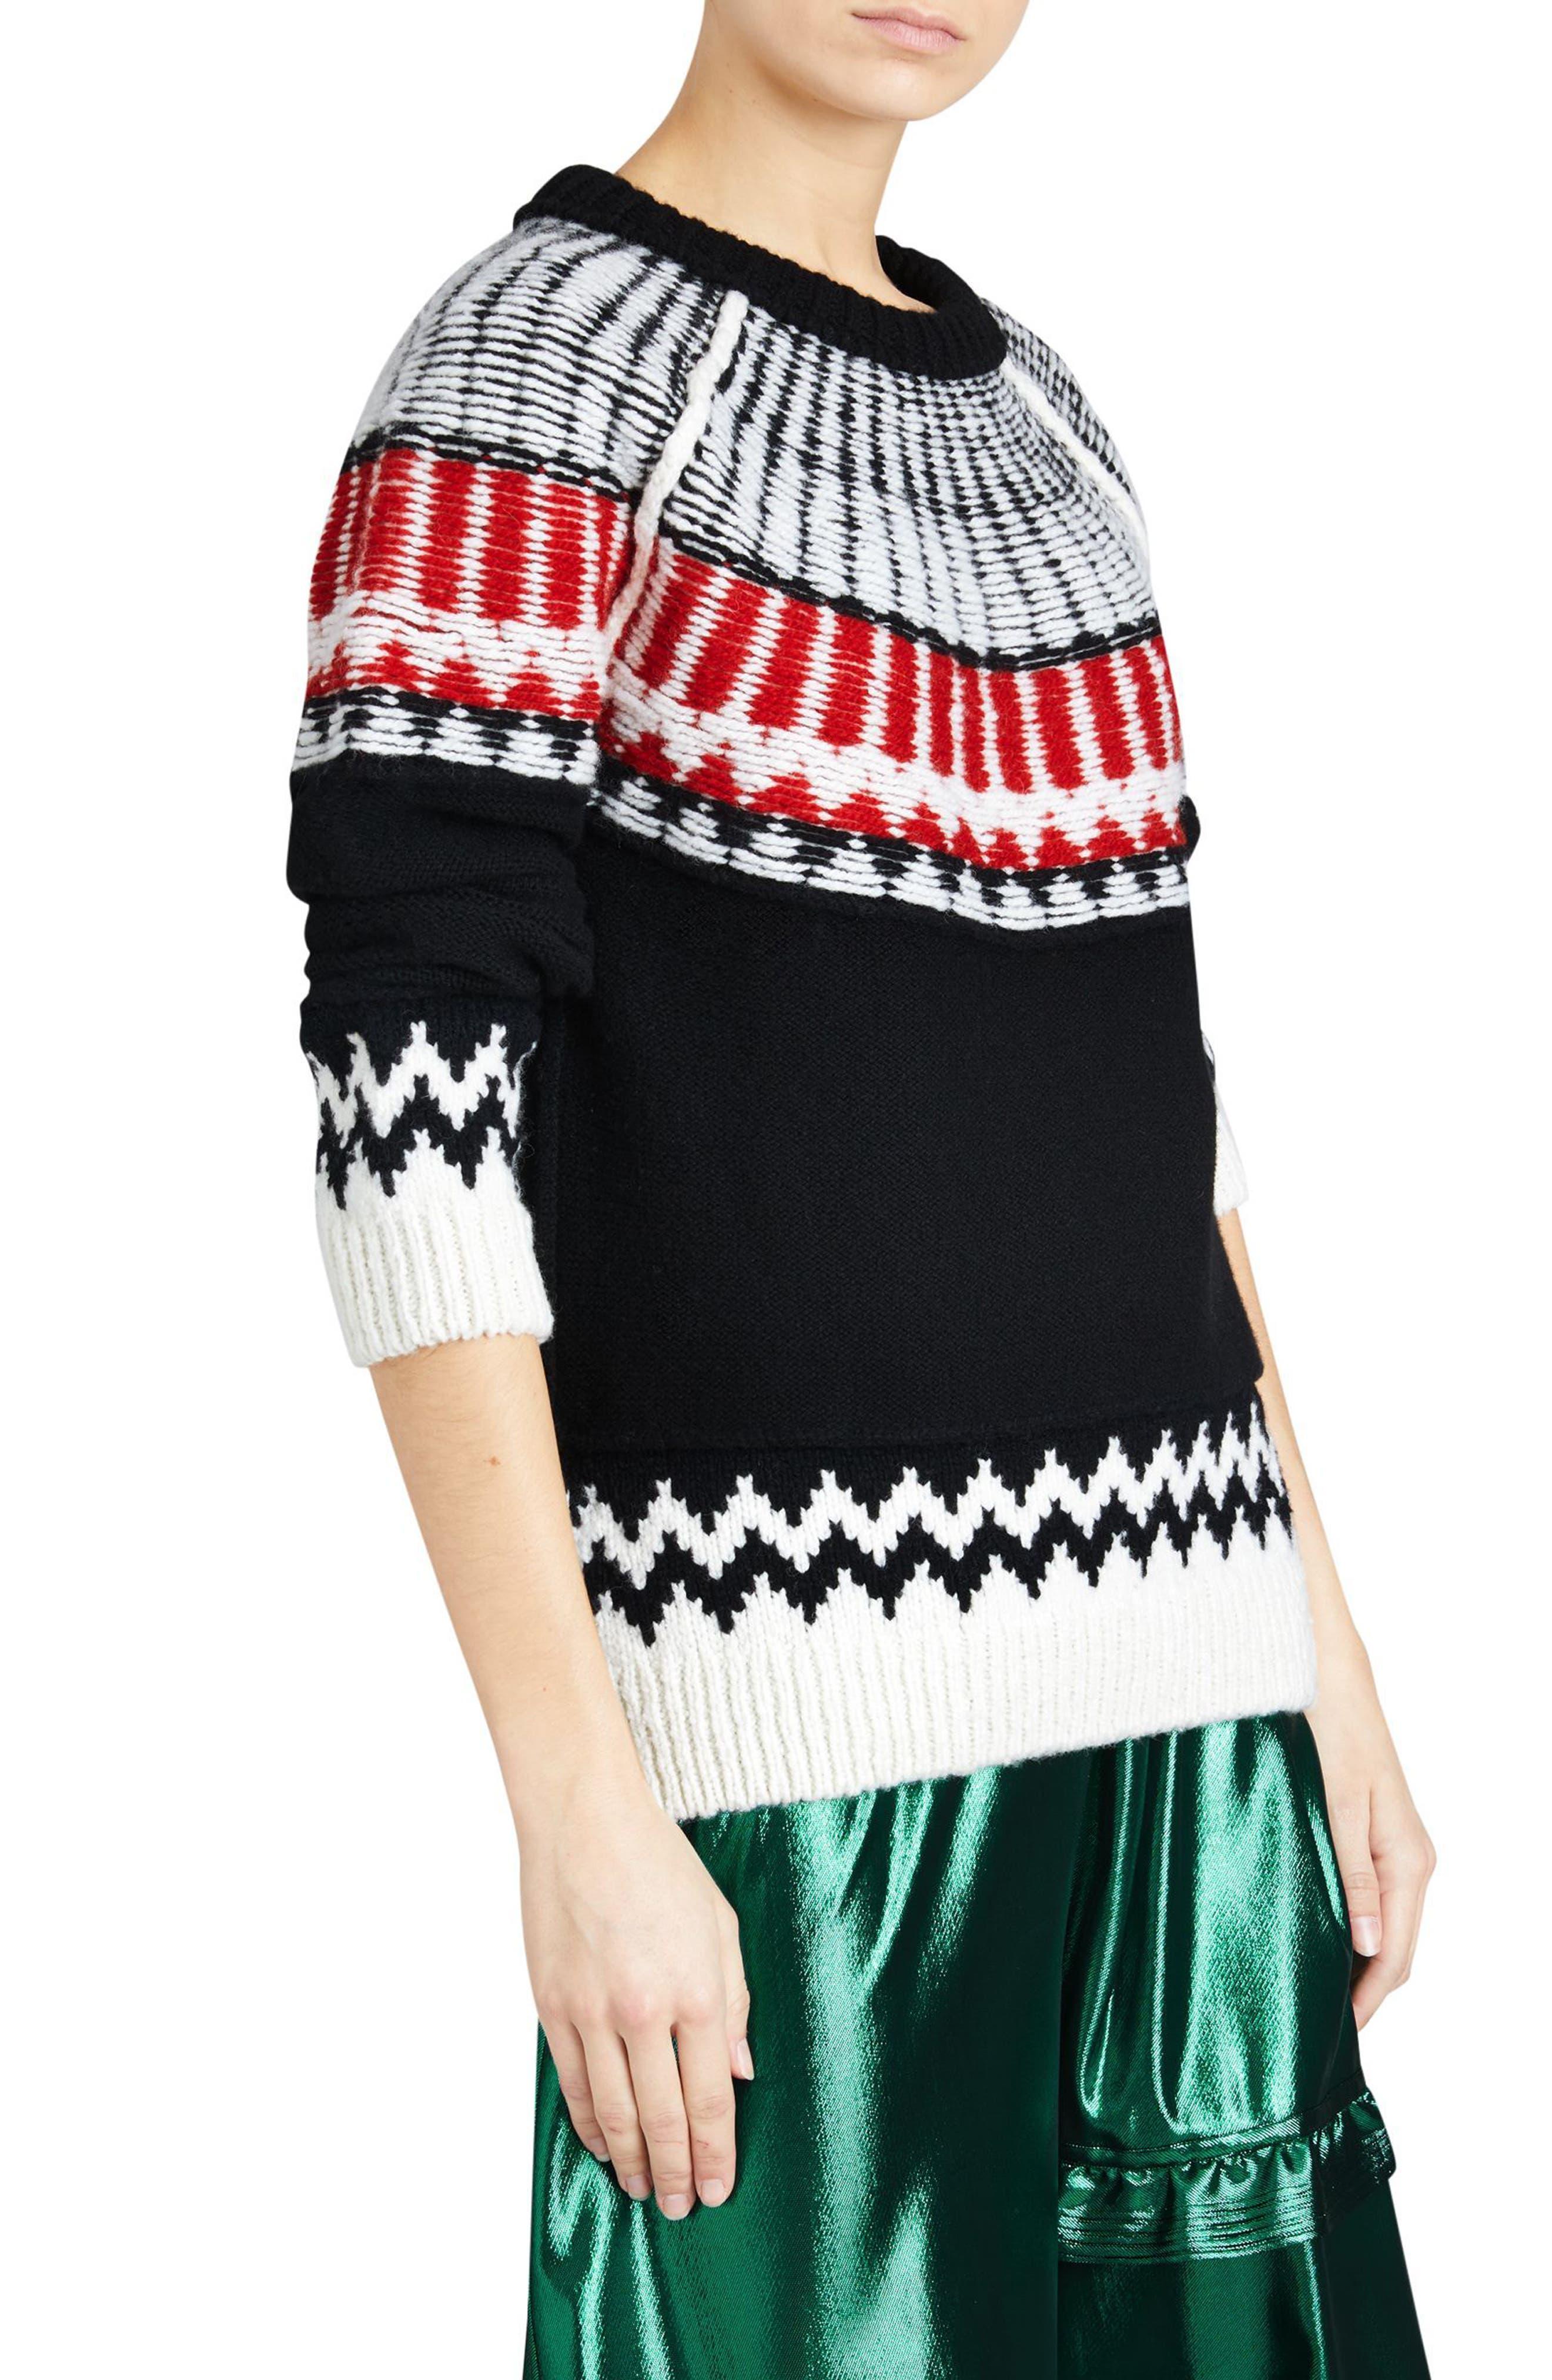 Trycroft Fair Isle Wool Blend Sweater,                             Alternate thumbnail 3, color,                             001